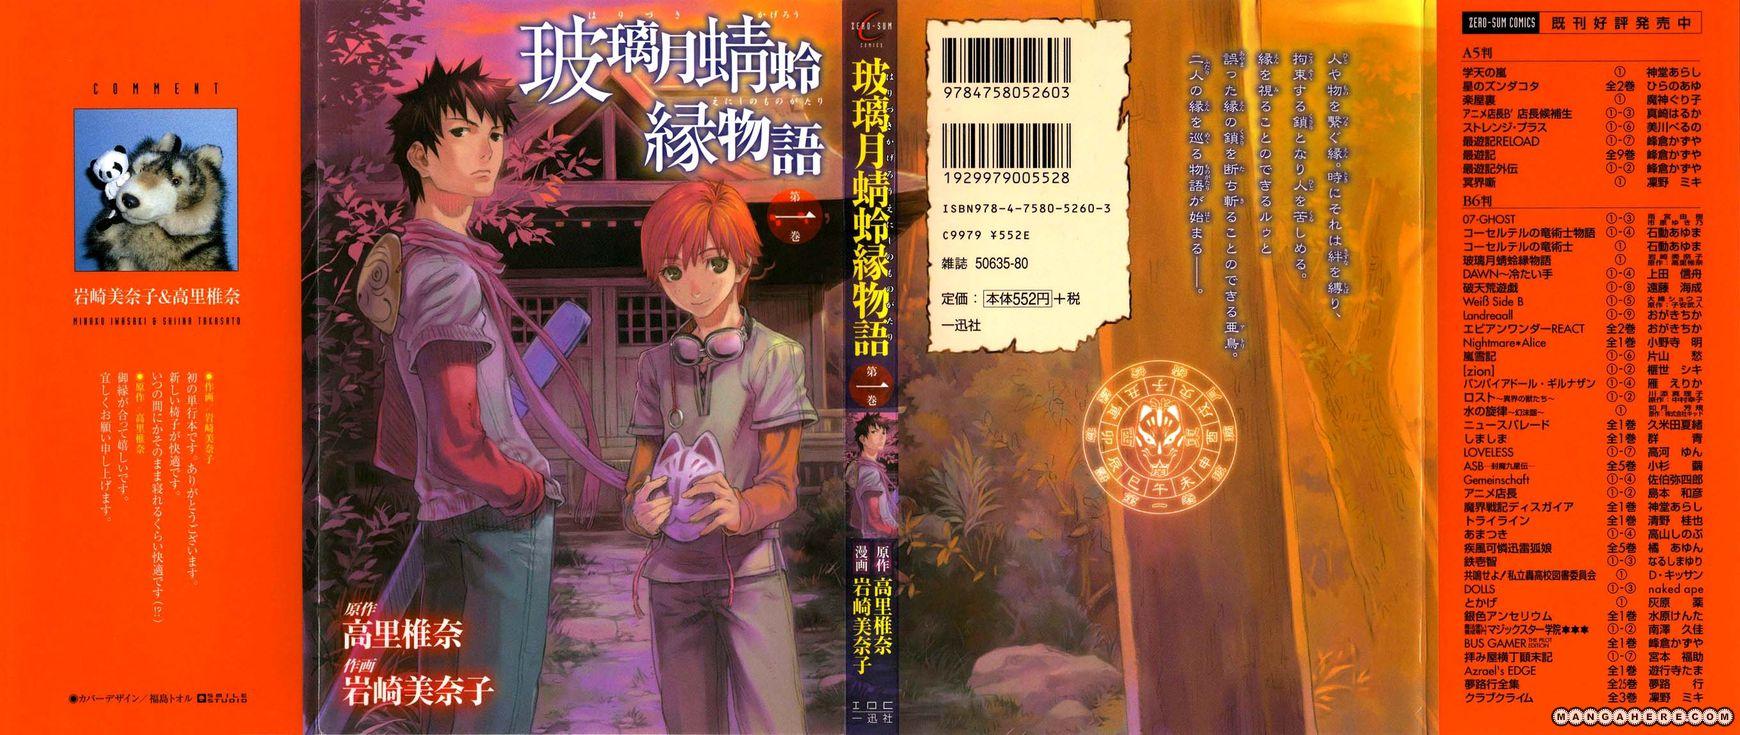 Harizuki Kagerou Enshimonogatari 1 Page 2